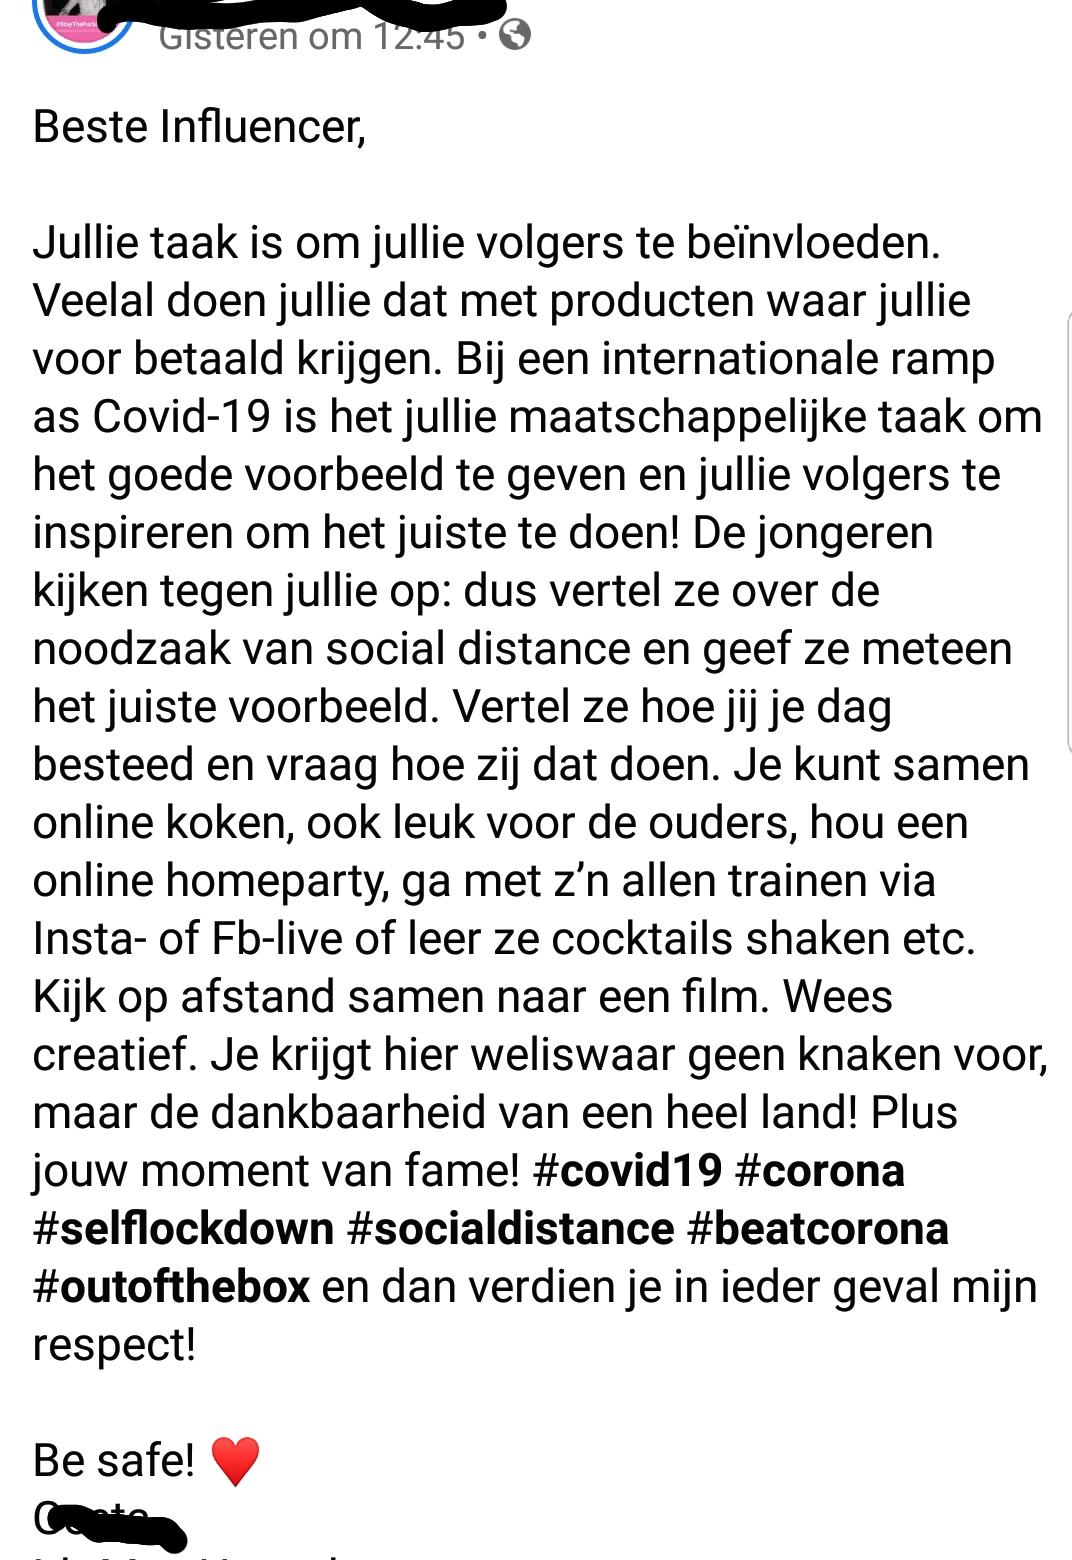 https://www.martinvrijland.nl/wp-content/uploads/2020/03/20200319_093718.jpg